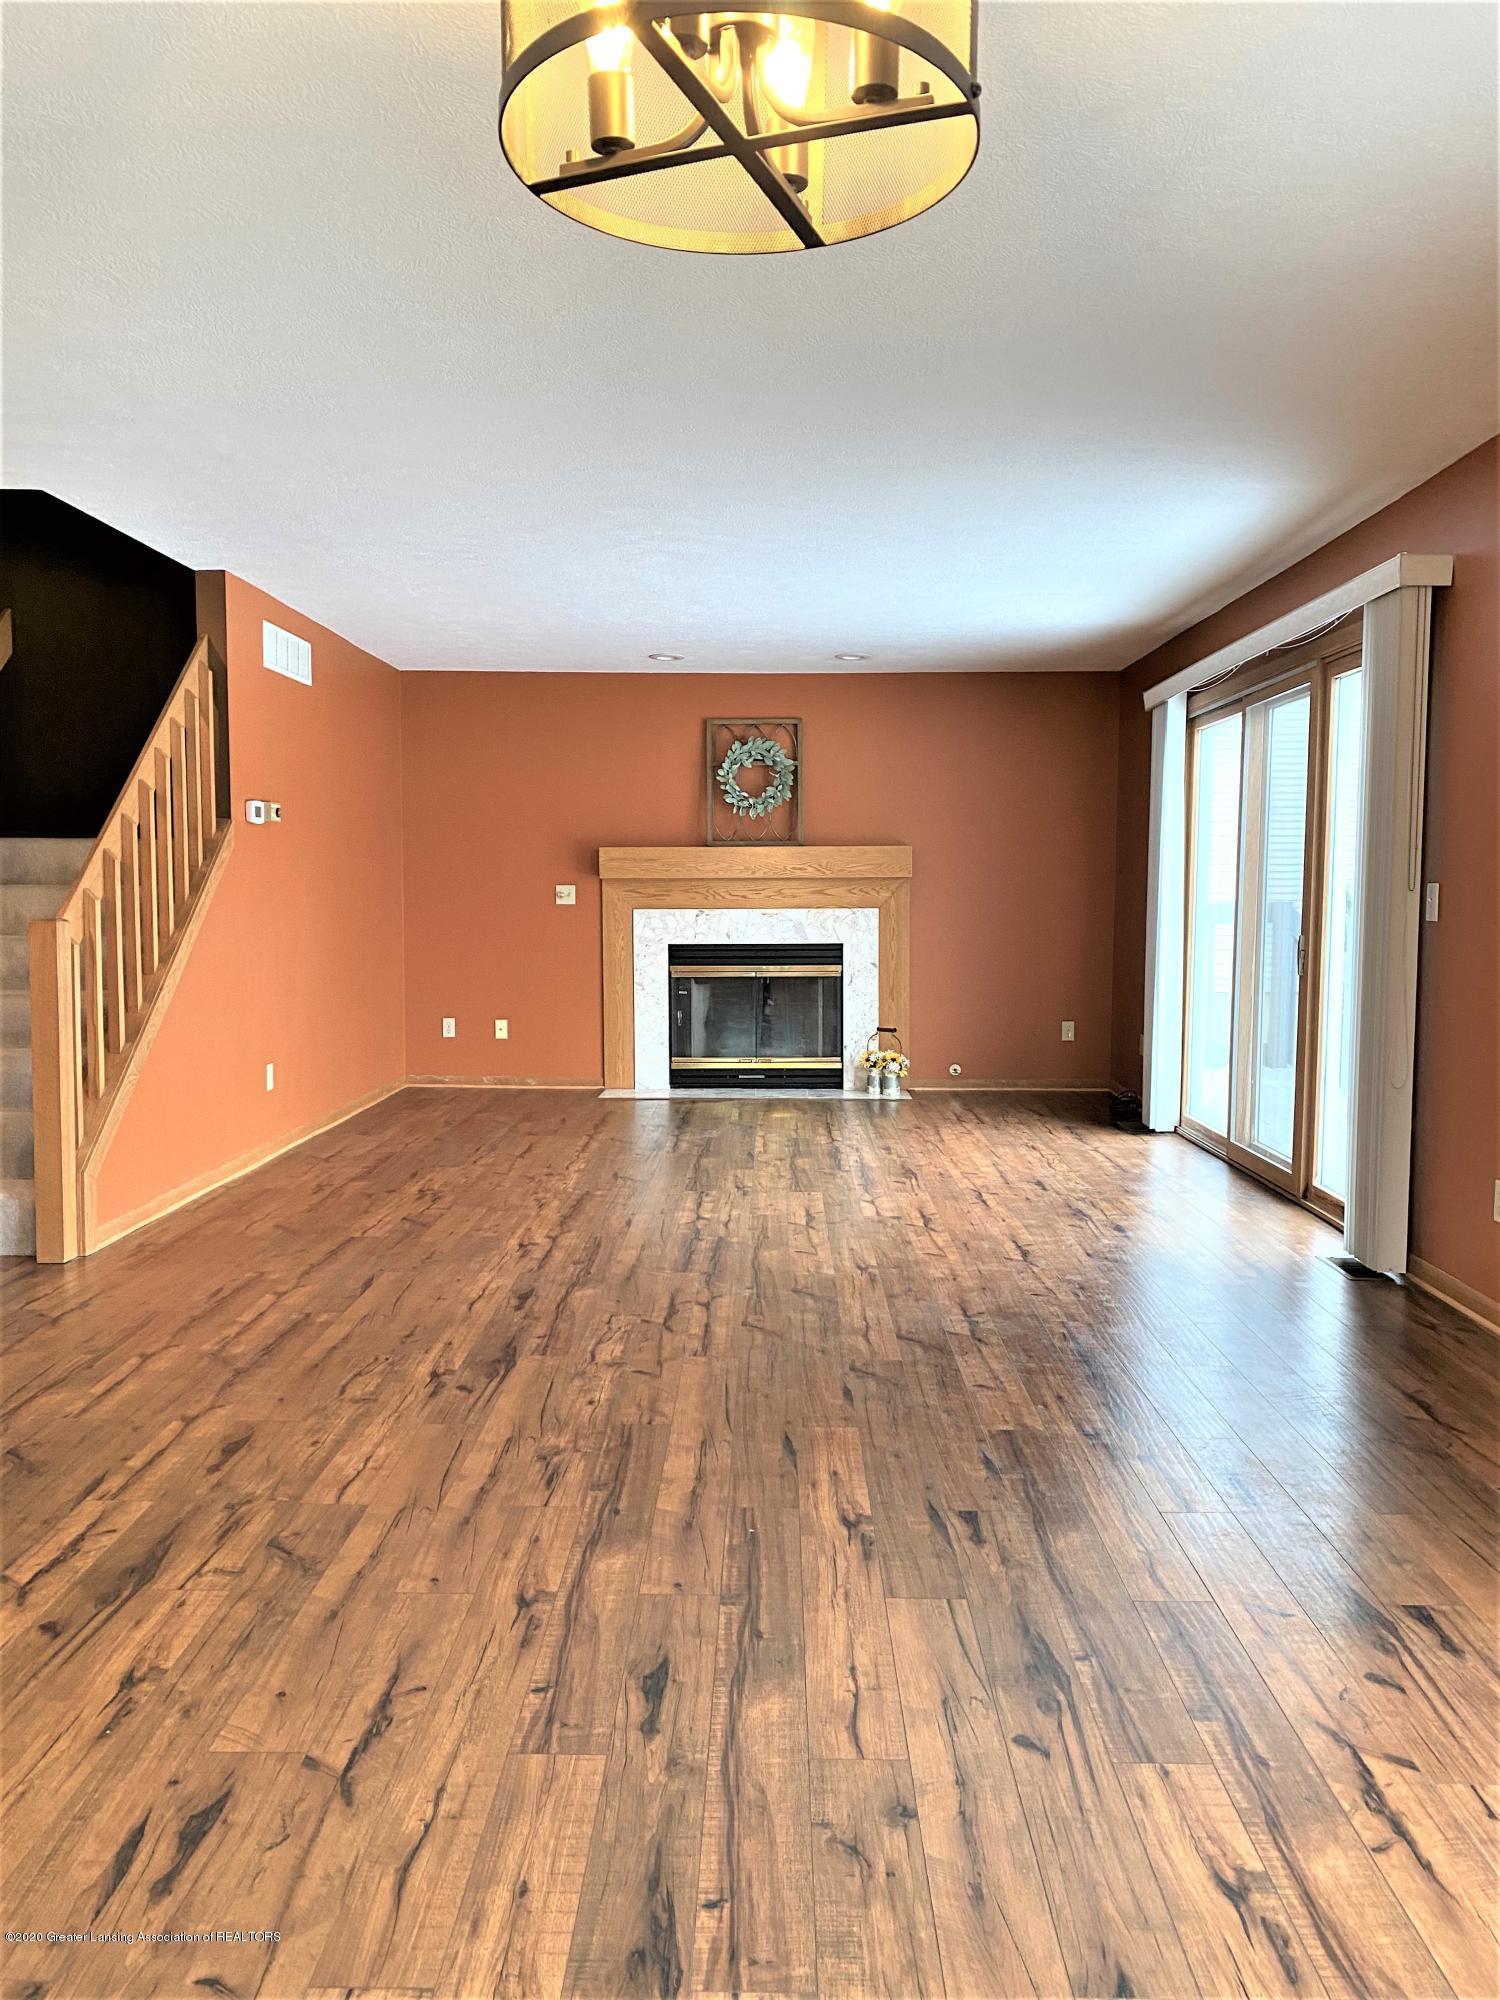 2475 Walenjus Ct - Living room - 13